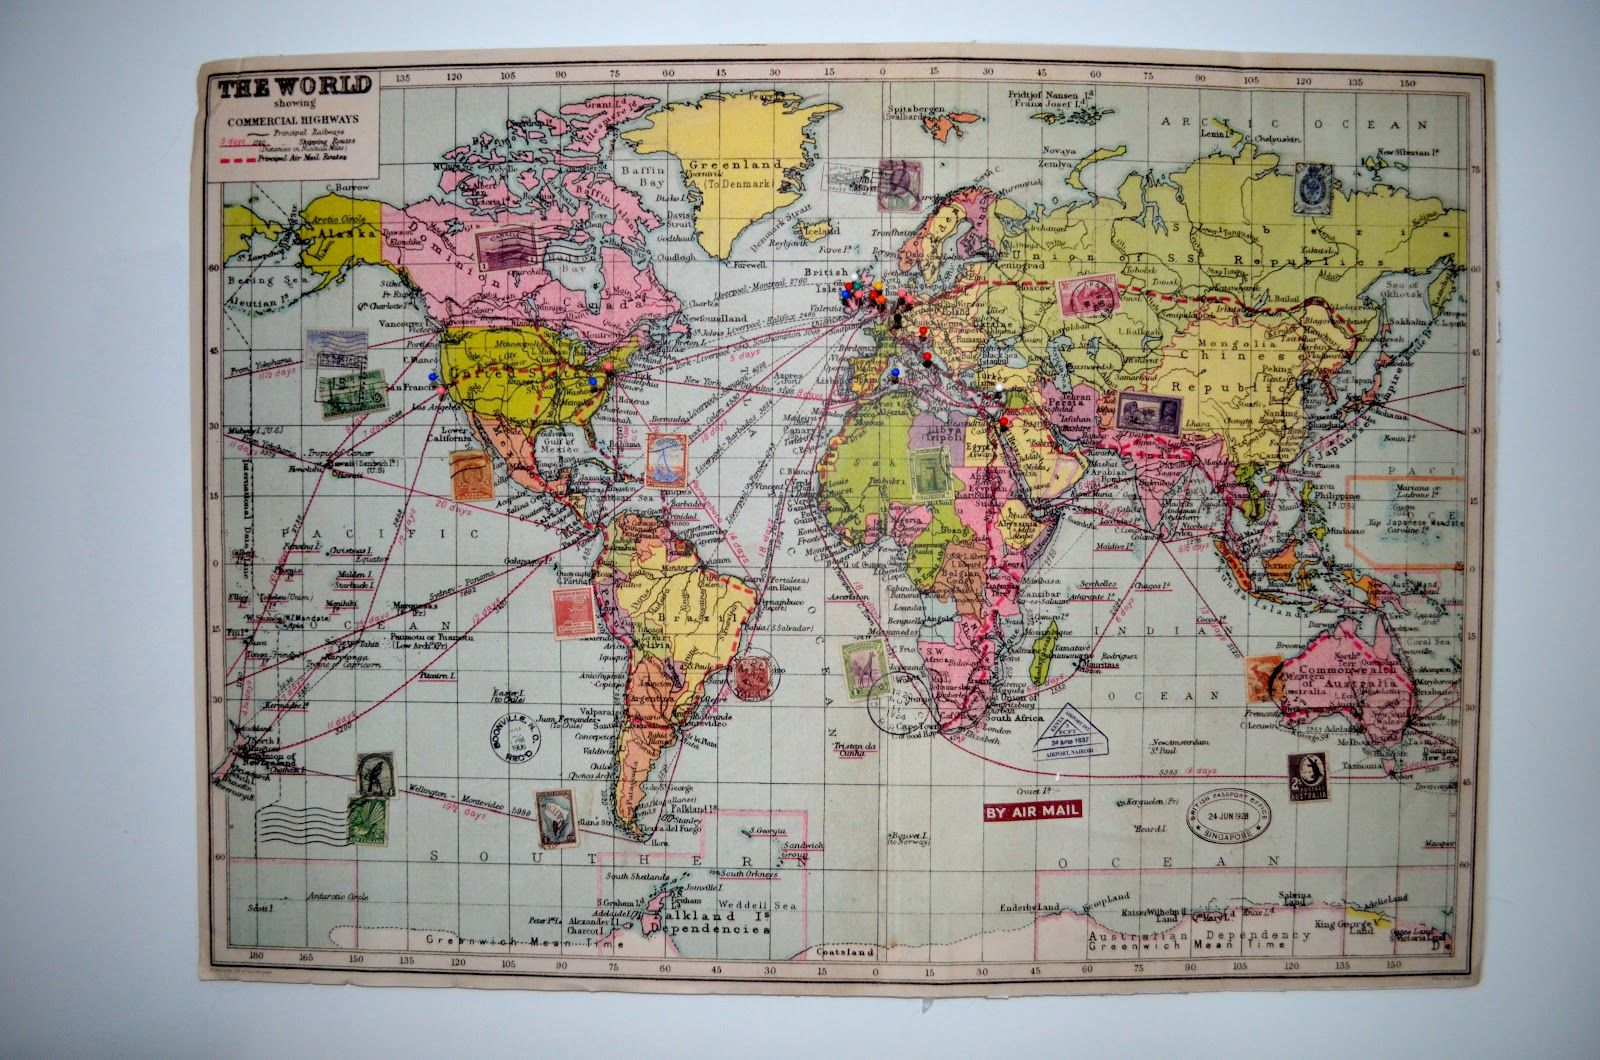 Diy world map pinboard mapsnroll pinterest pin boards diy world map pinboard gumiabroncs Image collections